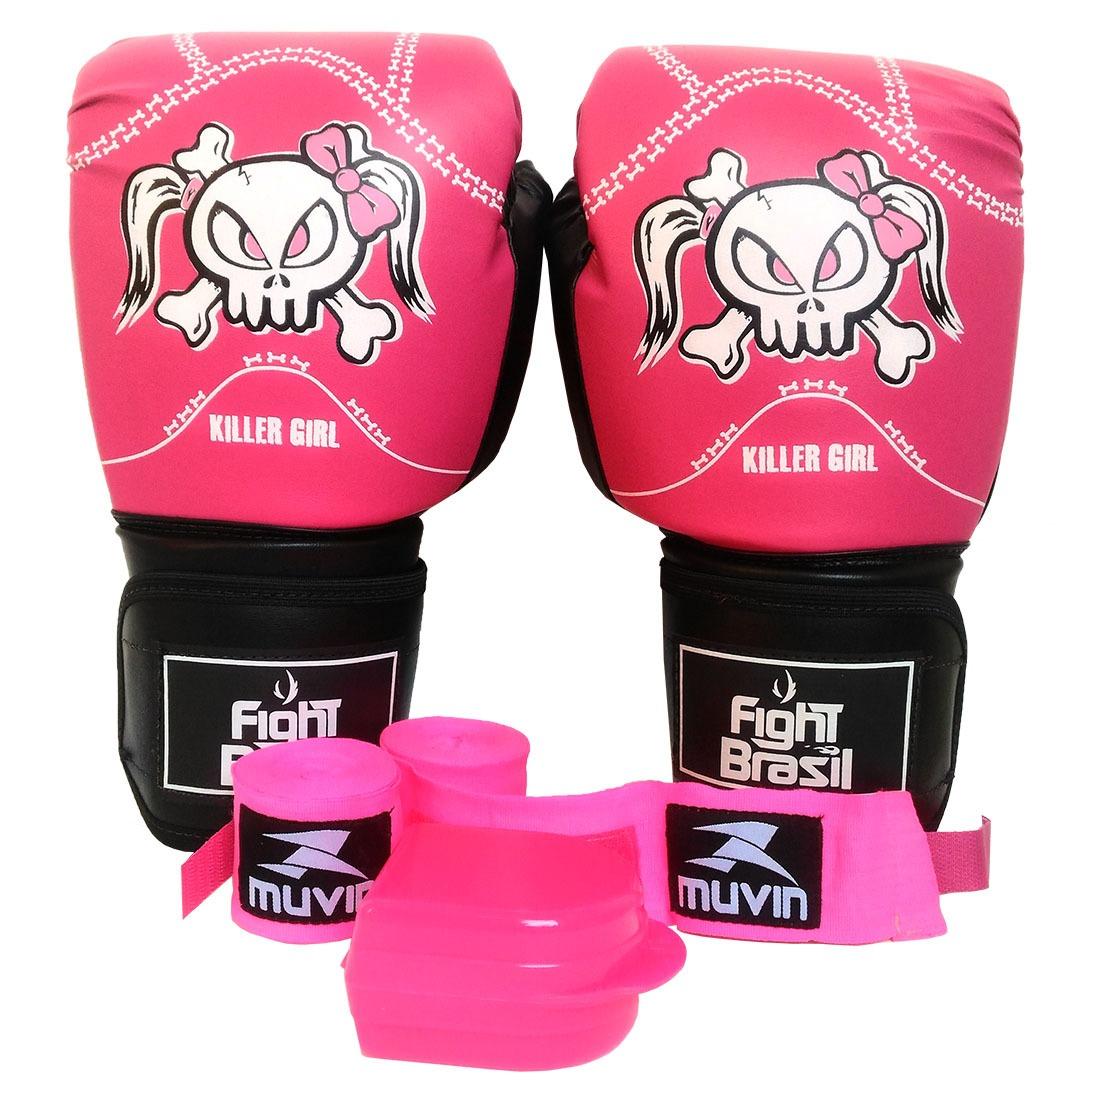 a3588e291 kit luva bandagem bucal muay thai boxe feminina fight brasil. Carregando  zoom.